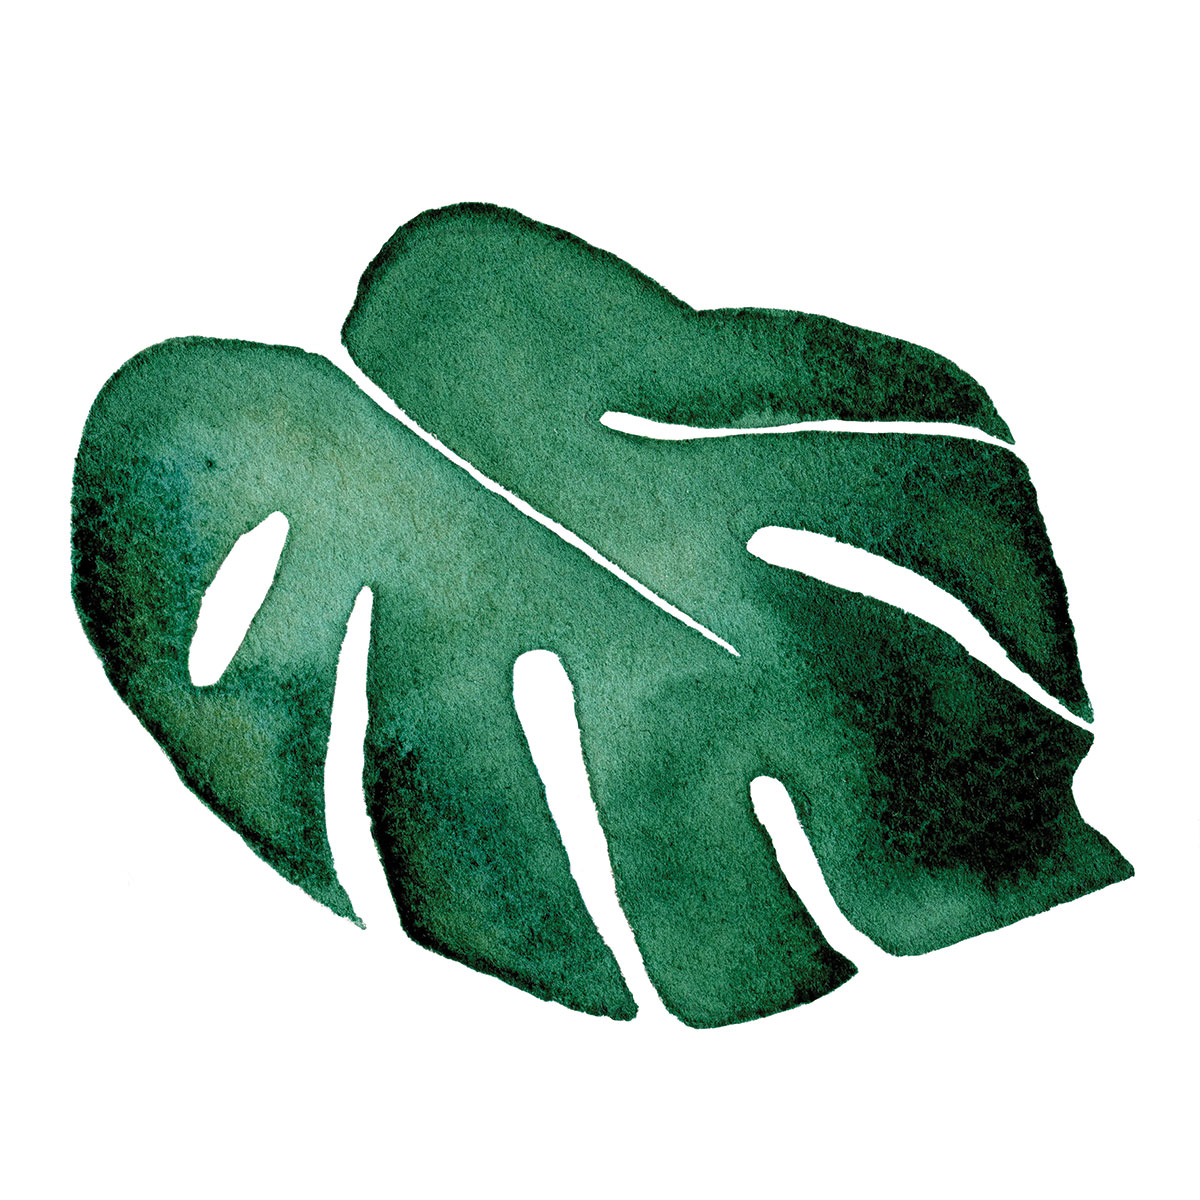 Lækker botanikprint - Home Junkie flisepynt